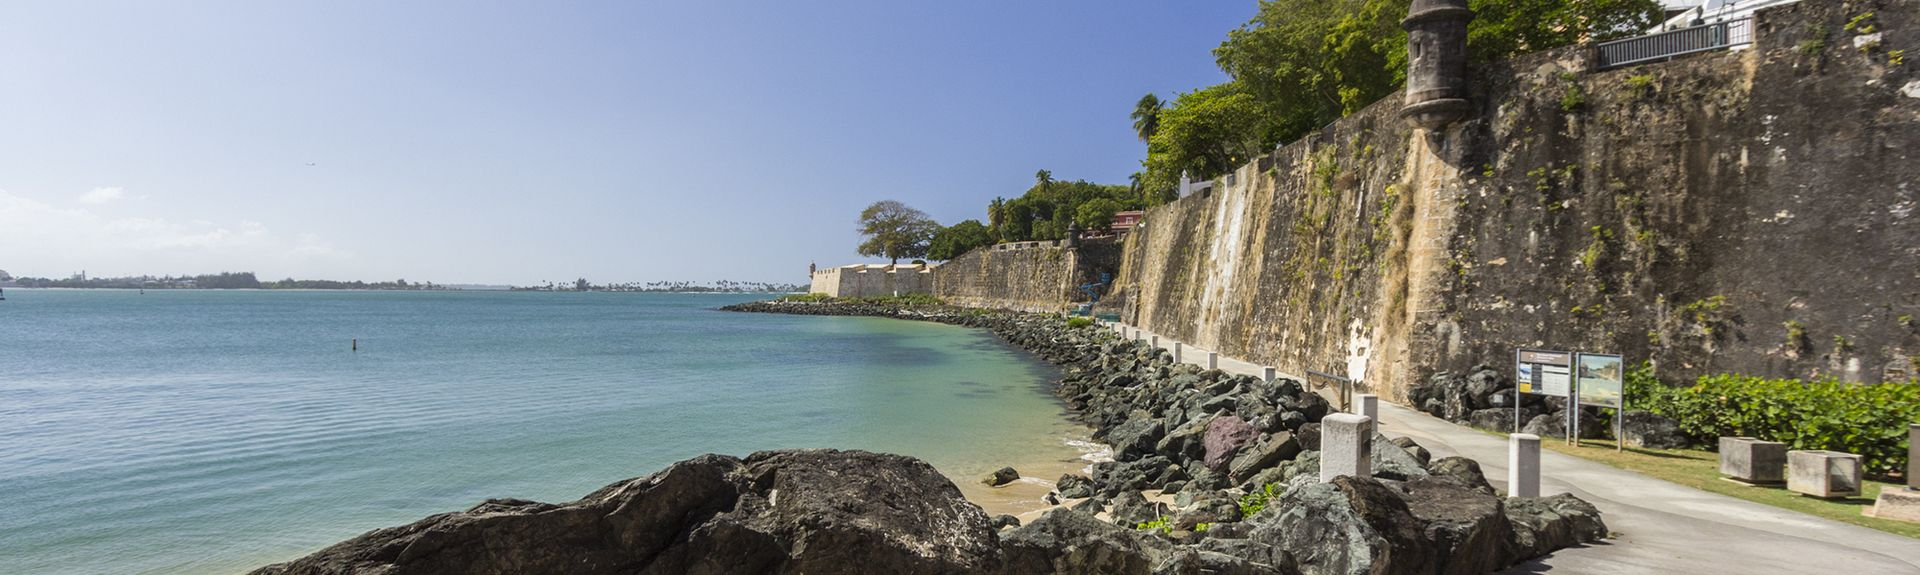 Gamle San Juan, San Juan, Puerto Rico